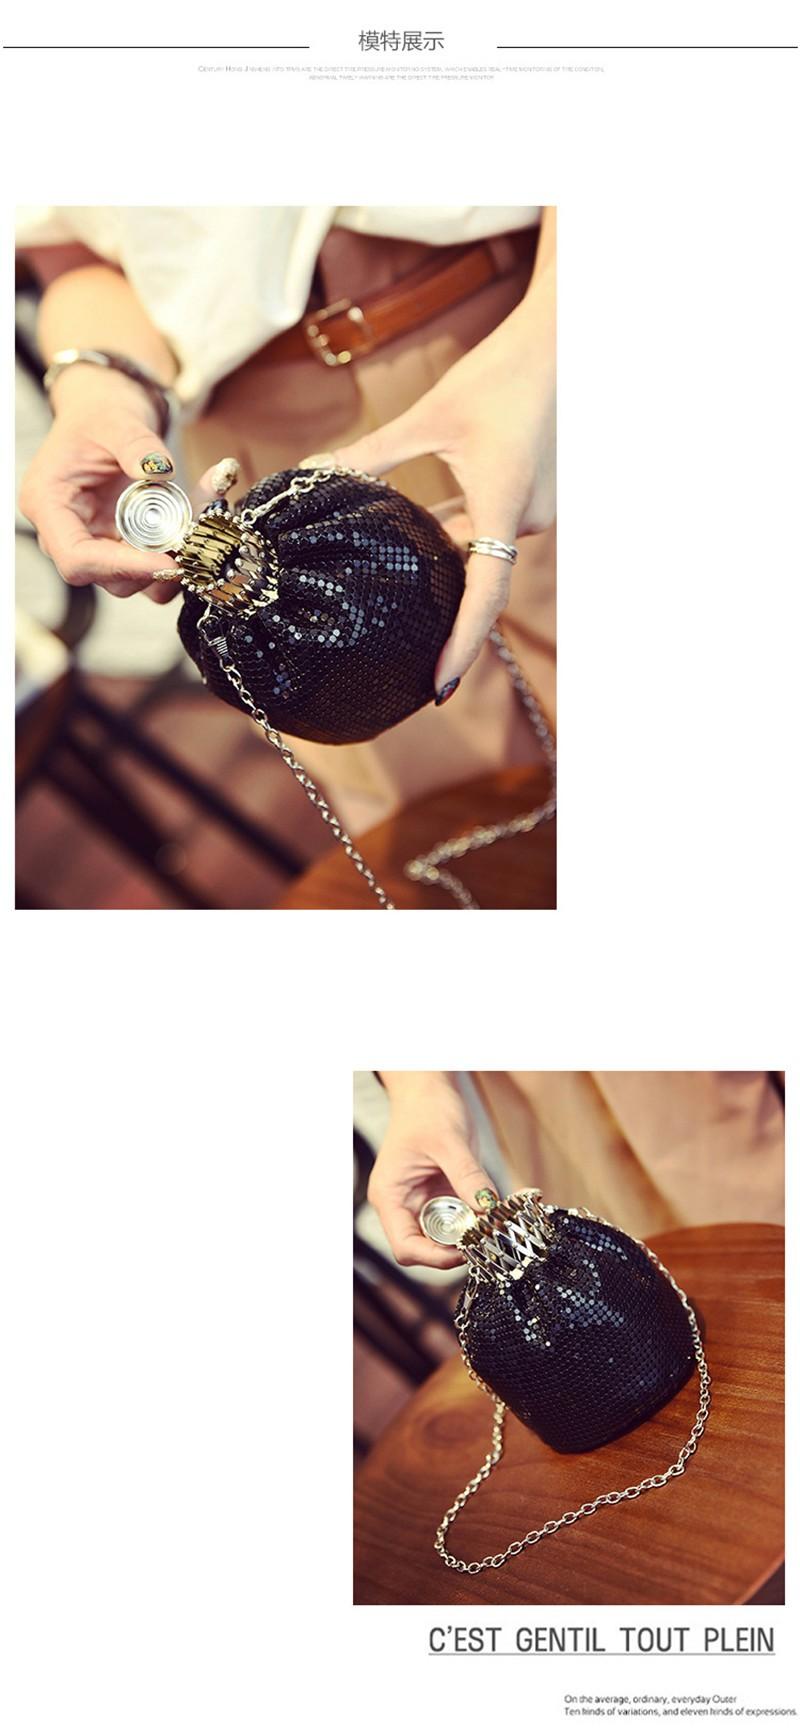 New-Shape-Hip-Flask-Bag-Fashion-Chain-Bucket-Personality-Single-Shoulder-Handbag-Women-Cross-Body-BAGS-SS0204 (13)